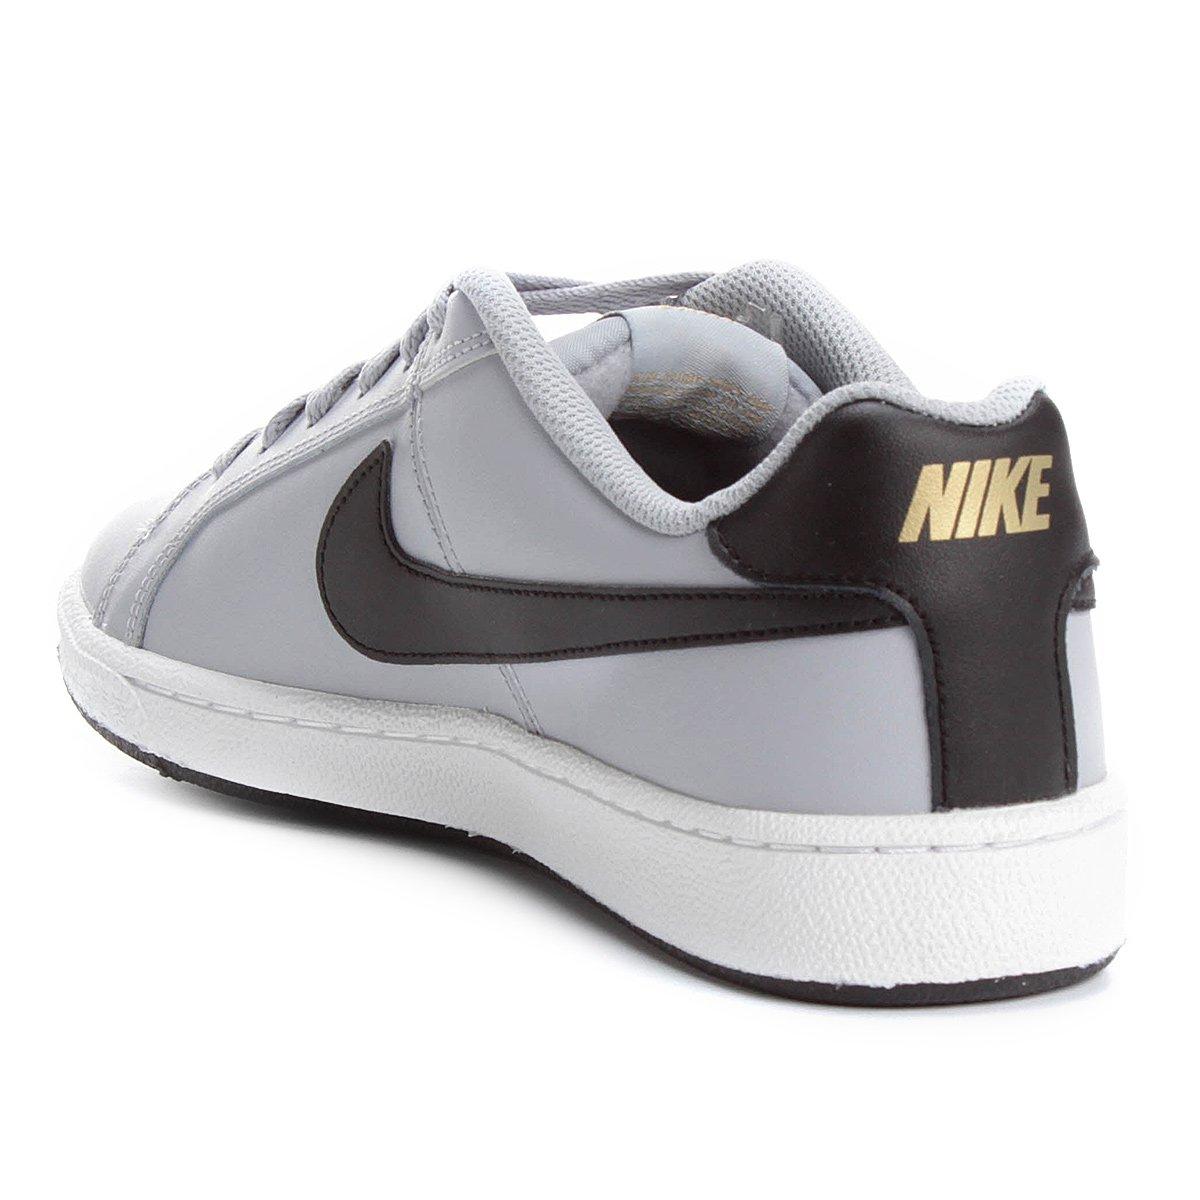 Bizz Store Tênis Feminino Nike Air Max 2015 Para Corrida